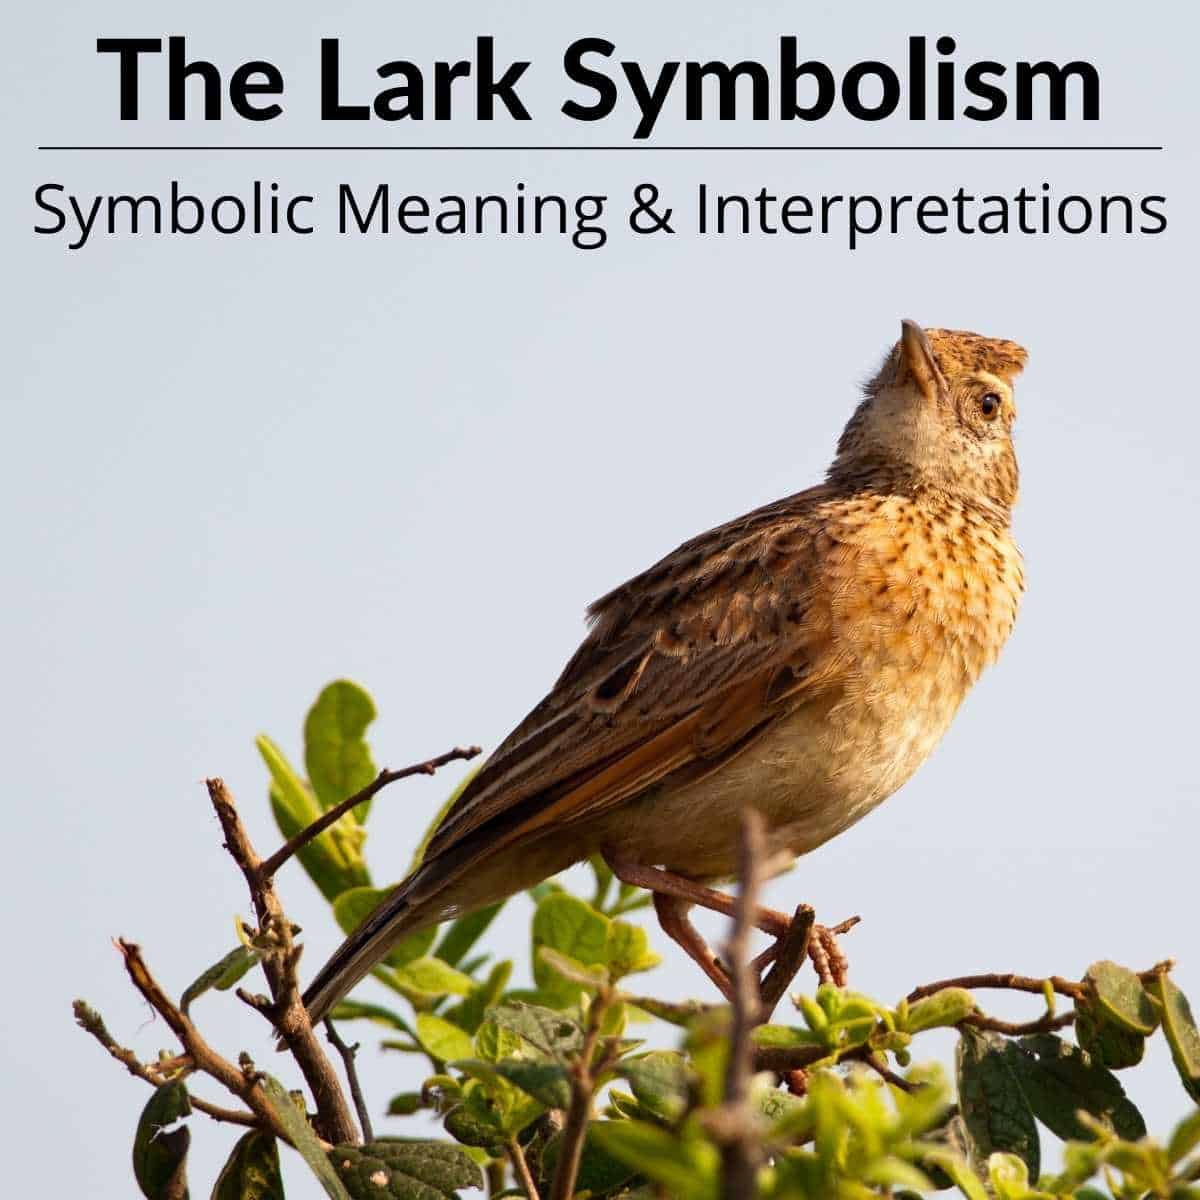 Lark Symbolism